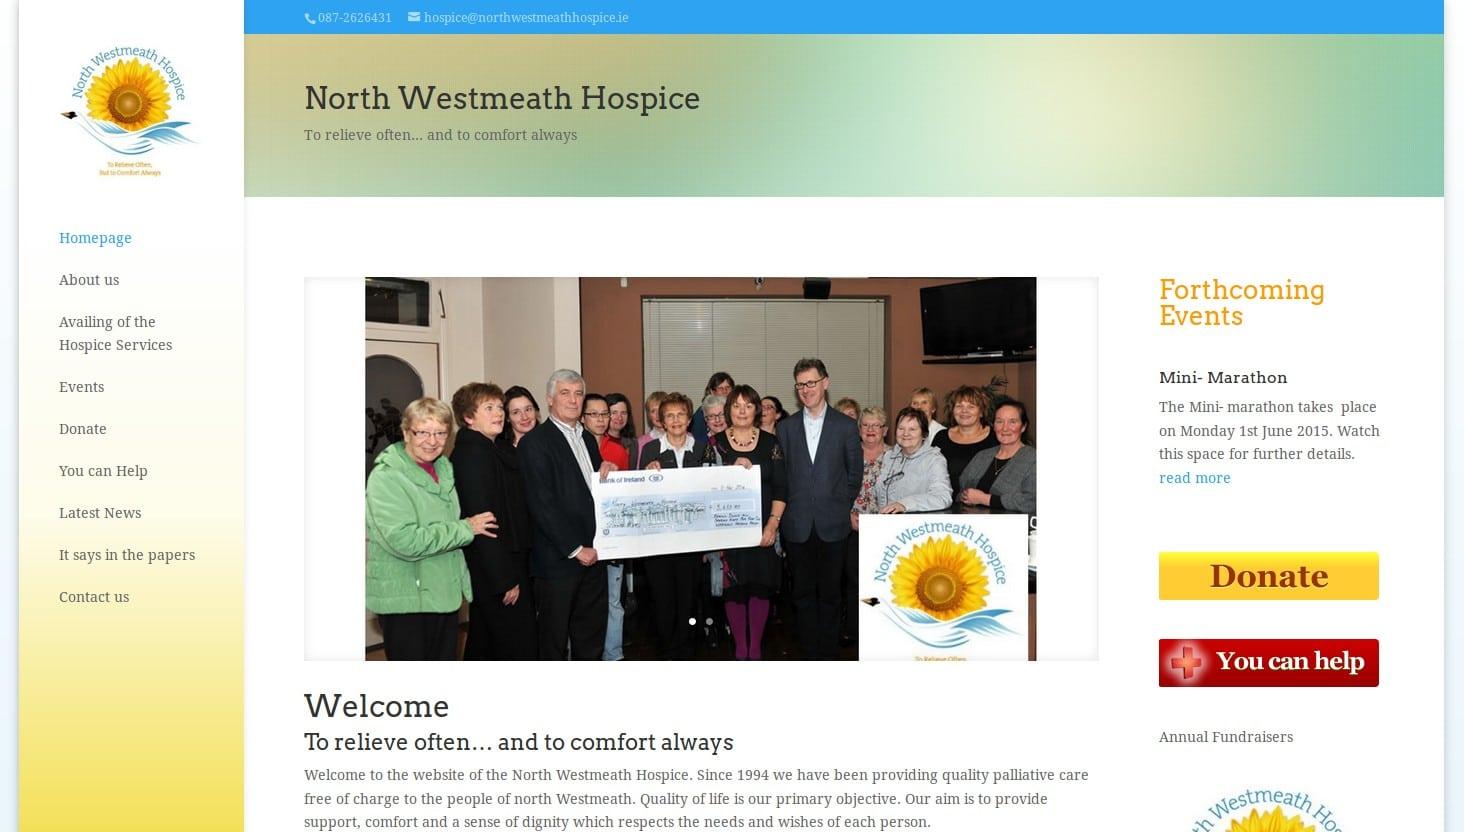 north westmeath hospice website